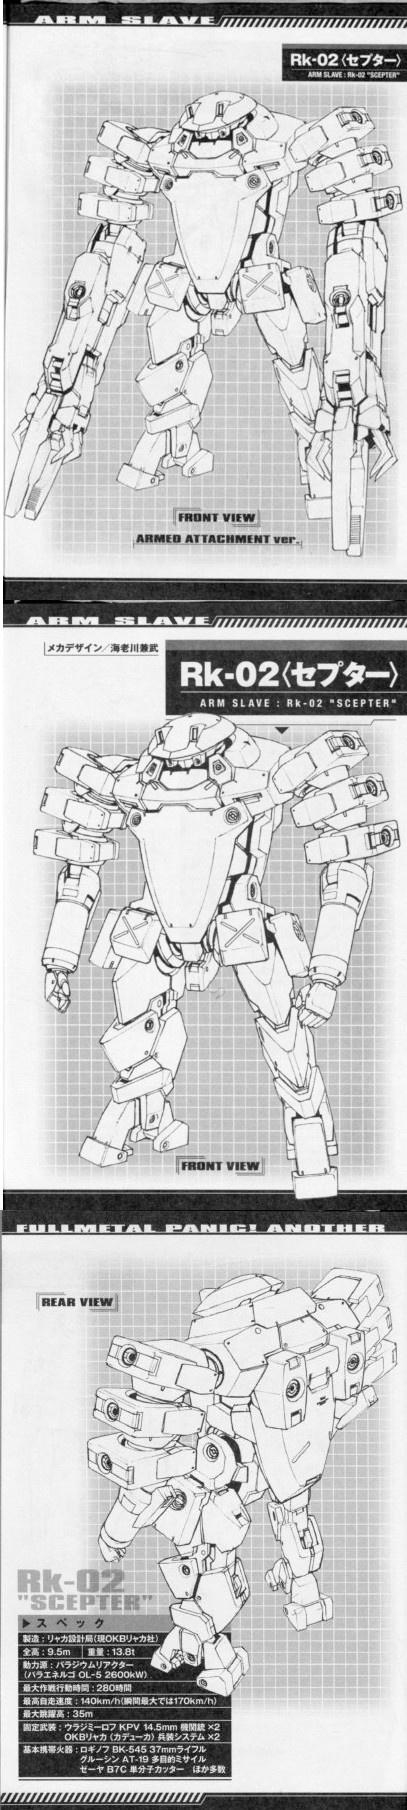 RK-02 ✤    CHARACTER DESIGN REFERENCES   キャラクターデザイン   çizgi film • Find more at https://www.facebook.com/CharacterDesignReferences http://www.pinterest.com/characterdesigh if you're looking for: bande dessinée, dessin animé #animation #banda #desenhada #toons #manga #BD #historieta #sketch #how #to #draw #strip #fumetto #settei #fumetti #manhwa #cartoni #animati #comics #cartoon    ✤